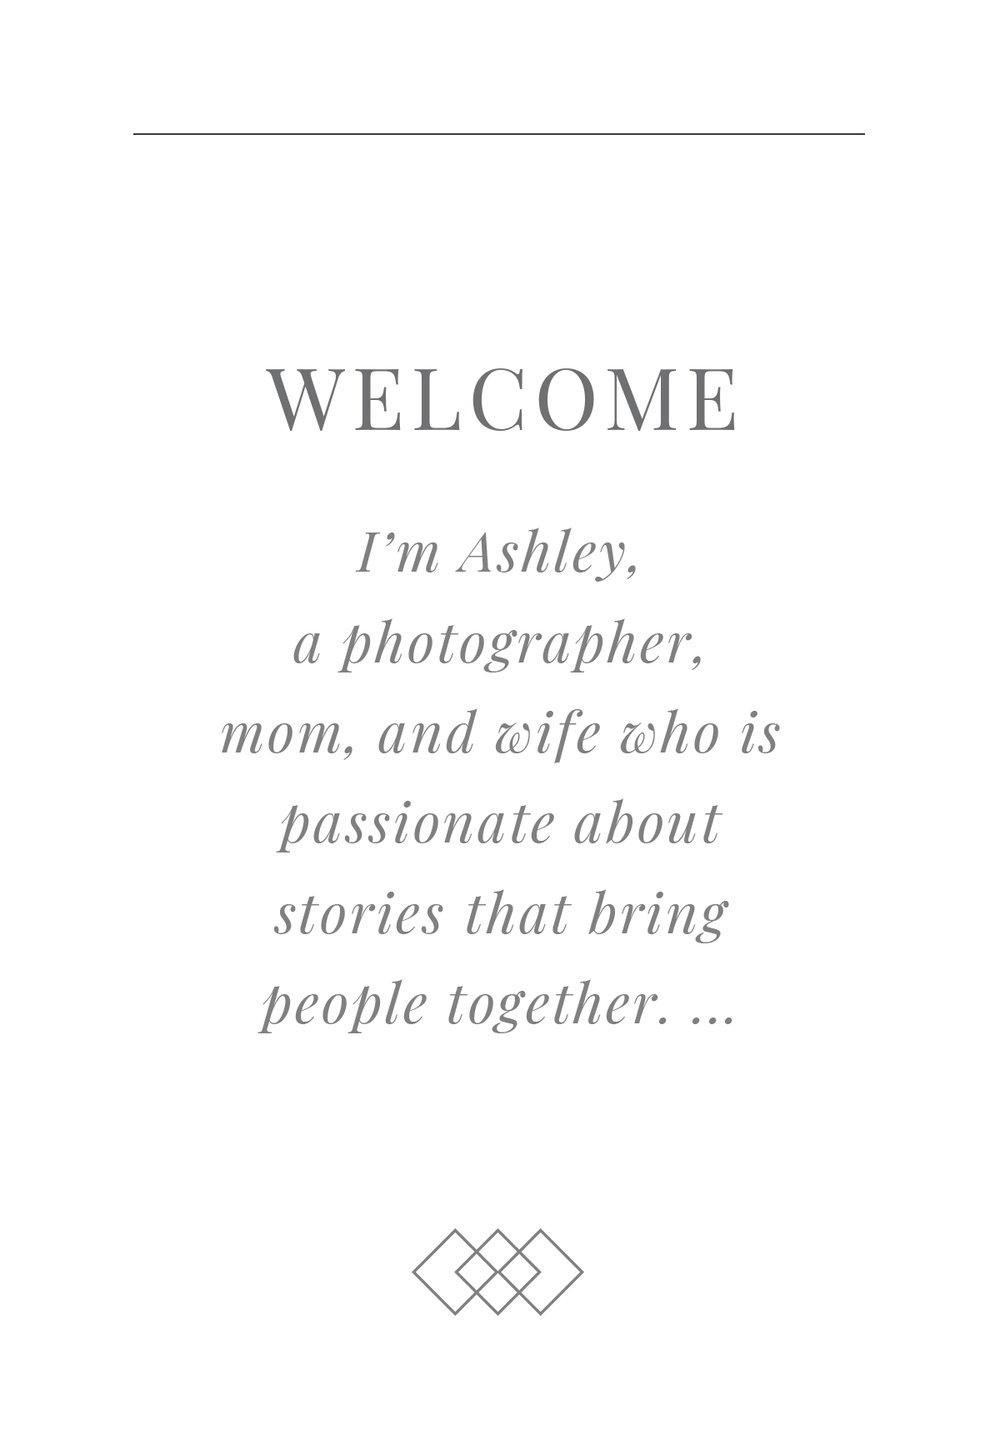 Welcome-To-Ashley-Amber-Photo.jpg